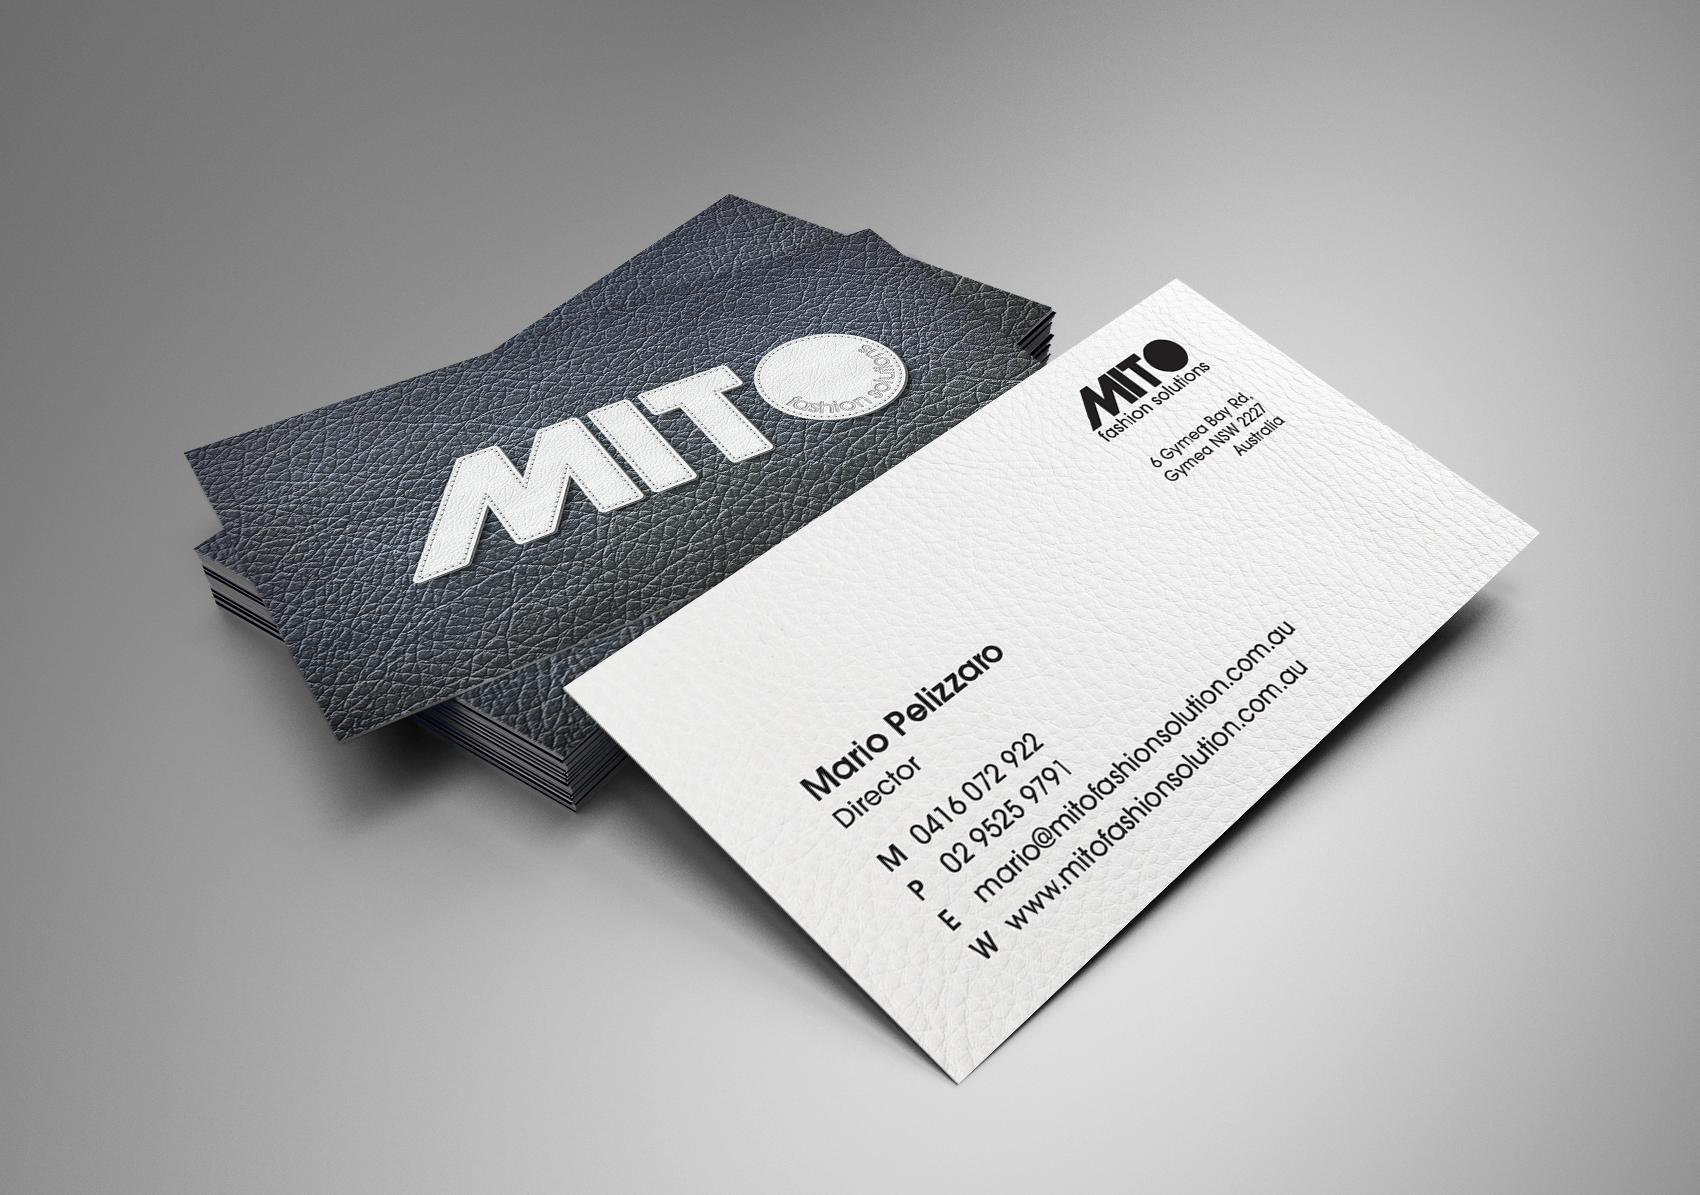 Mito fashion solution business cards kooka creative colourmoves